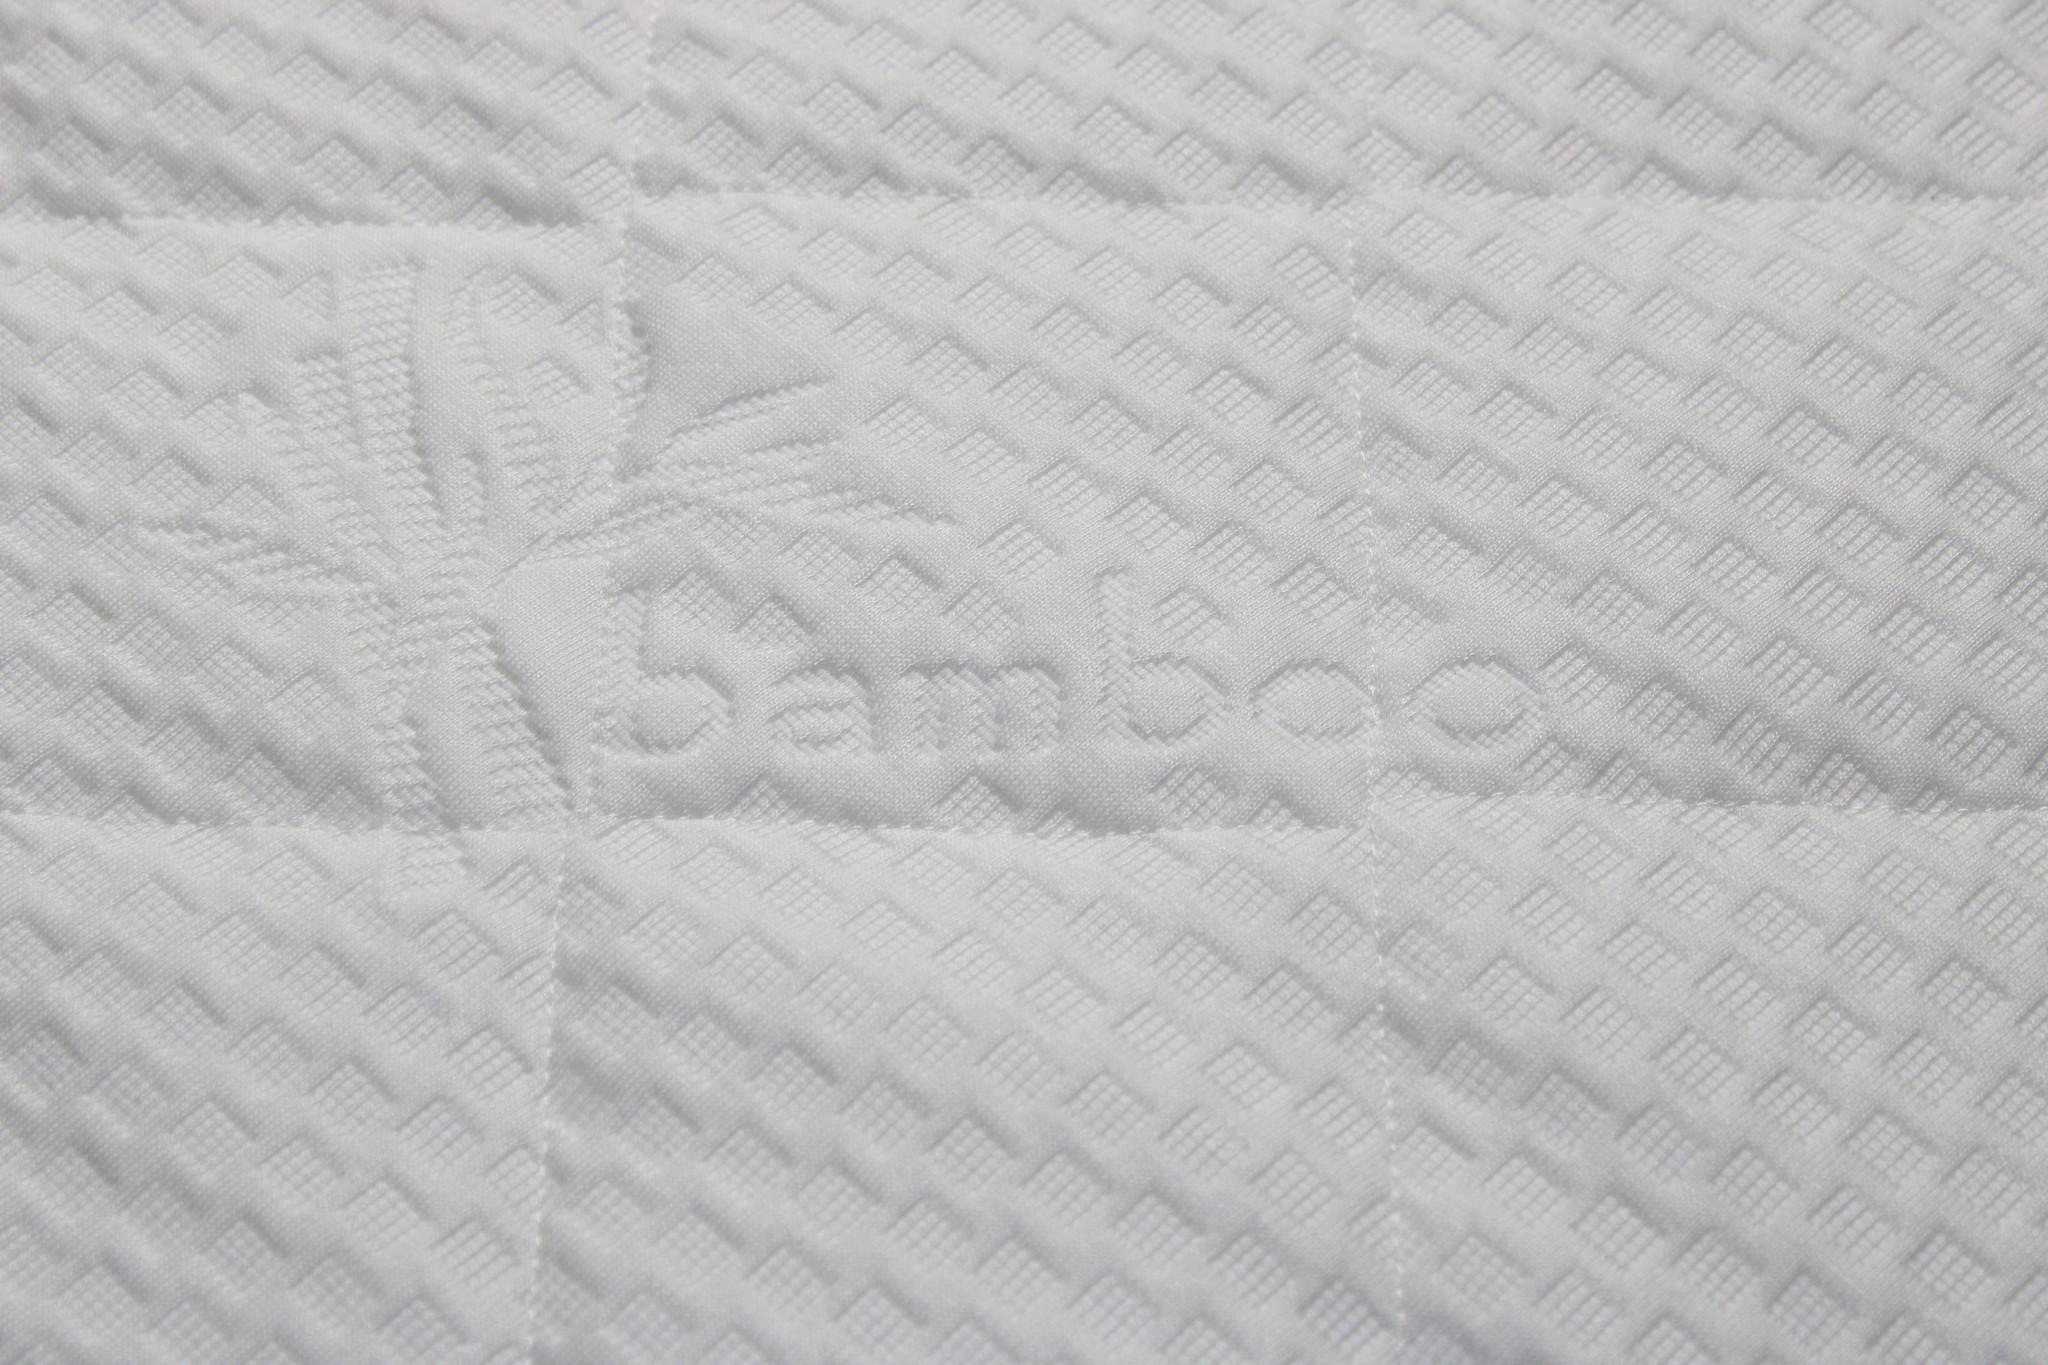 Sarpy Kindermatras 80x185 koudschuim hr40 bamboo